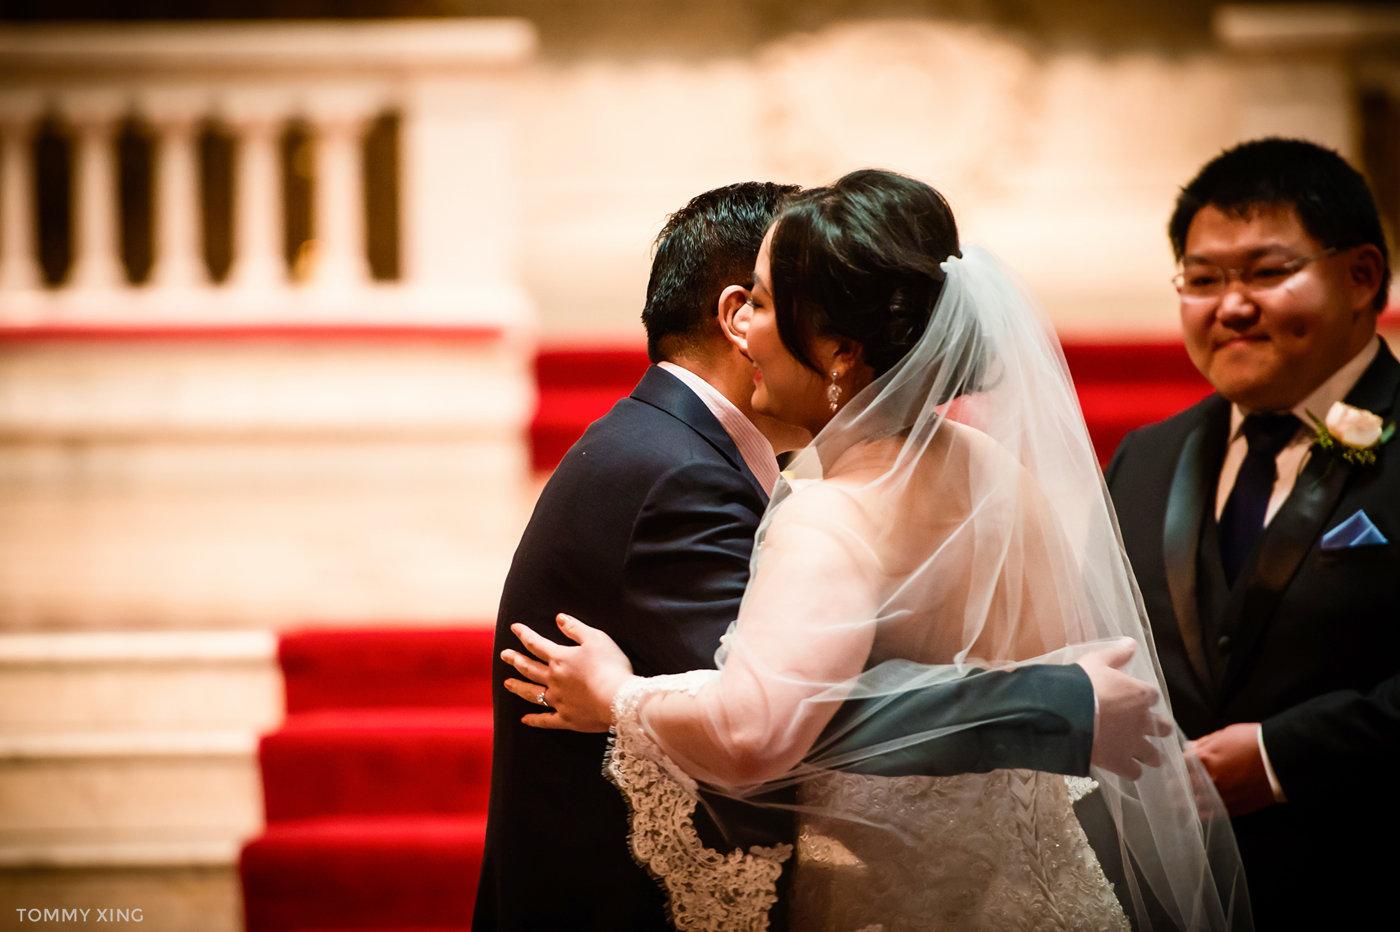 STANFORD MEMORIAL CHURCH WEDDING - Wenjie & Chengcheng - SAN FRANCISCO BAY AREA 斯坦福教堂婚礼跟拍 - 洛杉矶婚礼婚纱照摄影师 Tommy Xing Photography081.jpg